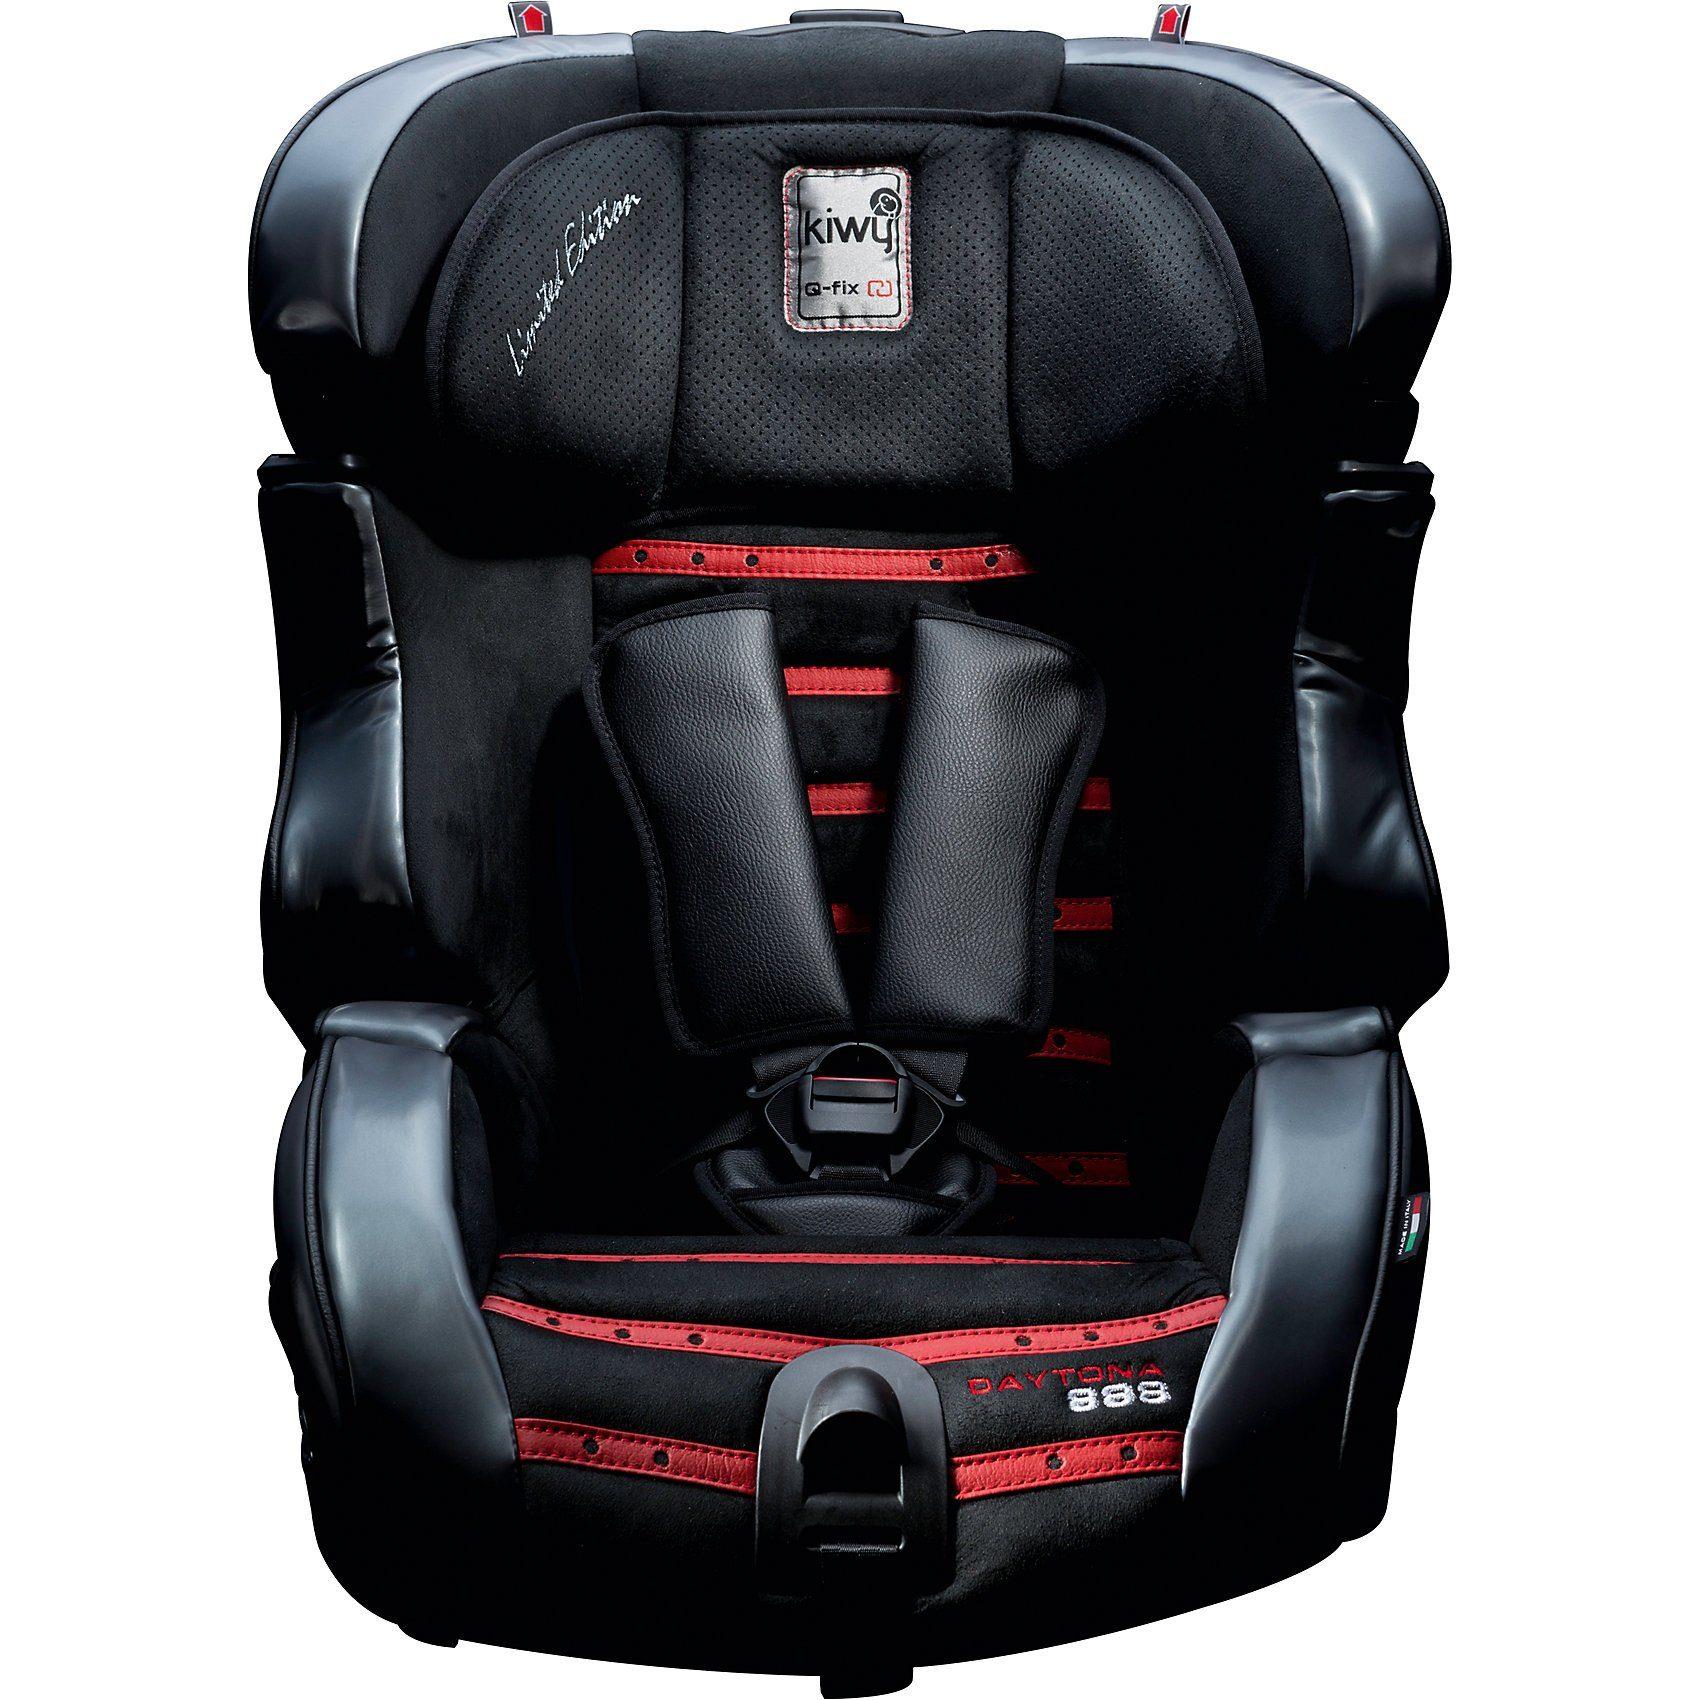 Kiwy Auto-Kindersitz SLF123 Q-Fix Daytona 888, Schwarz-Rot, 2017